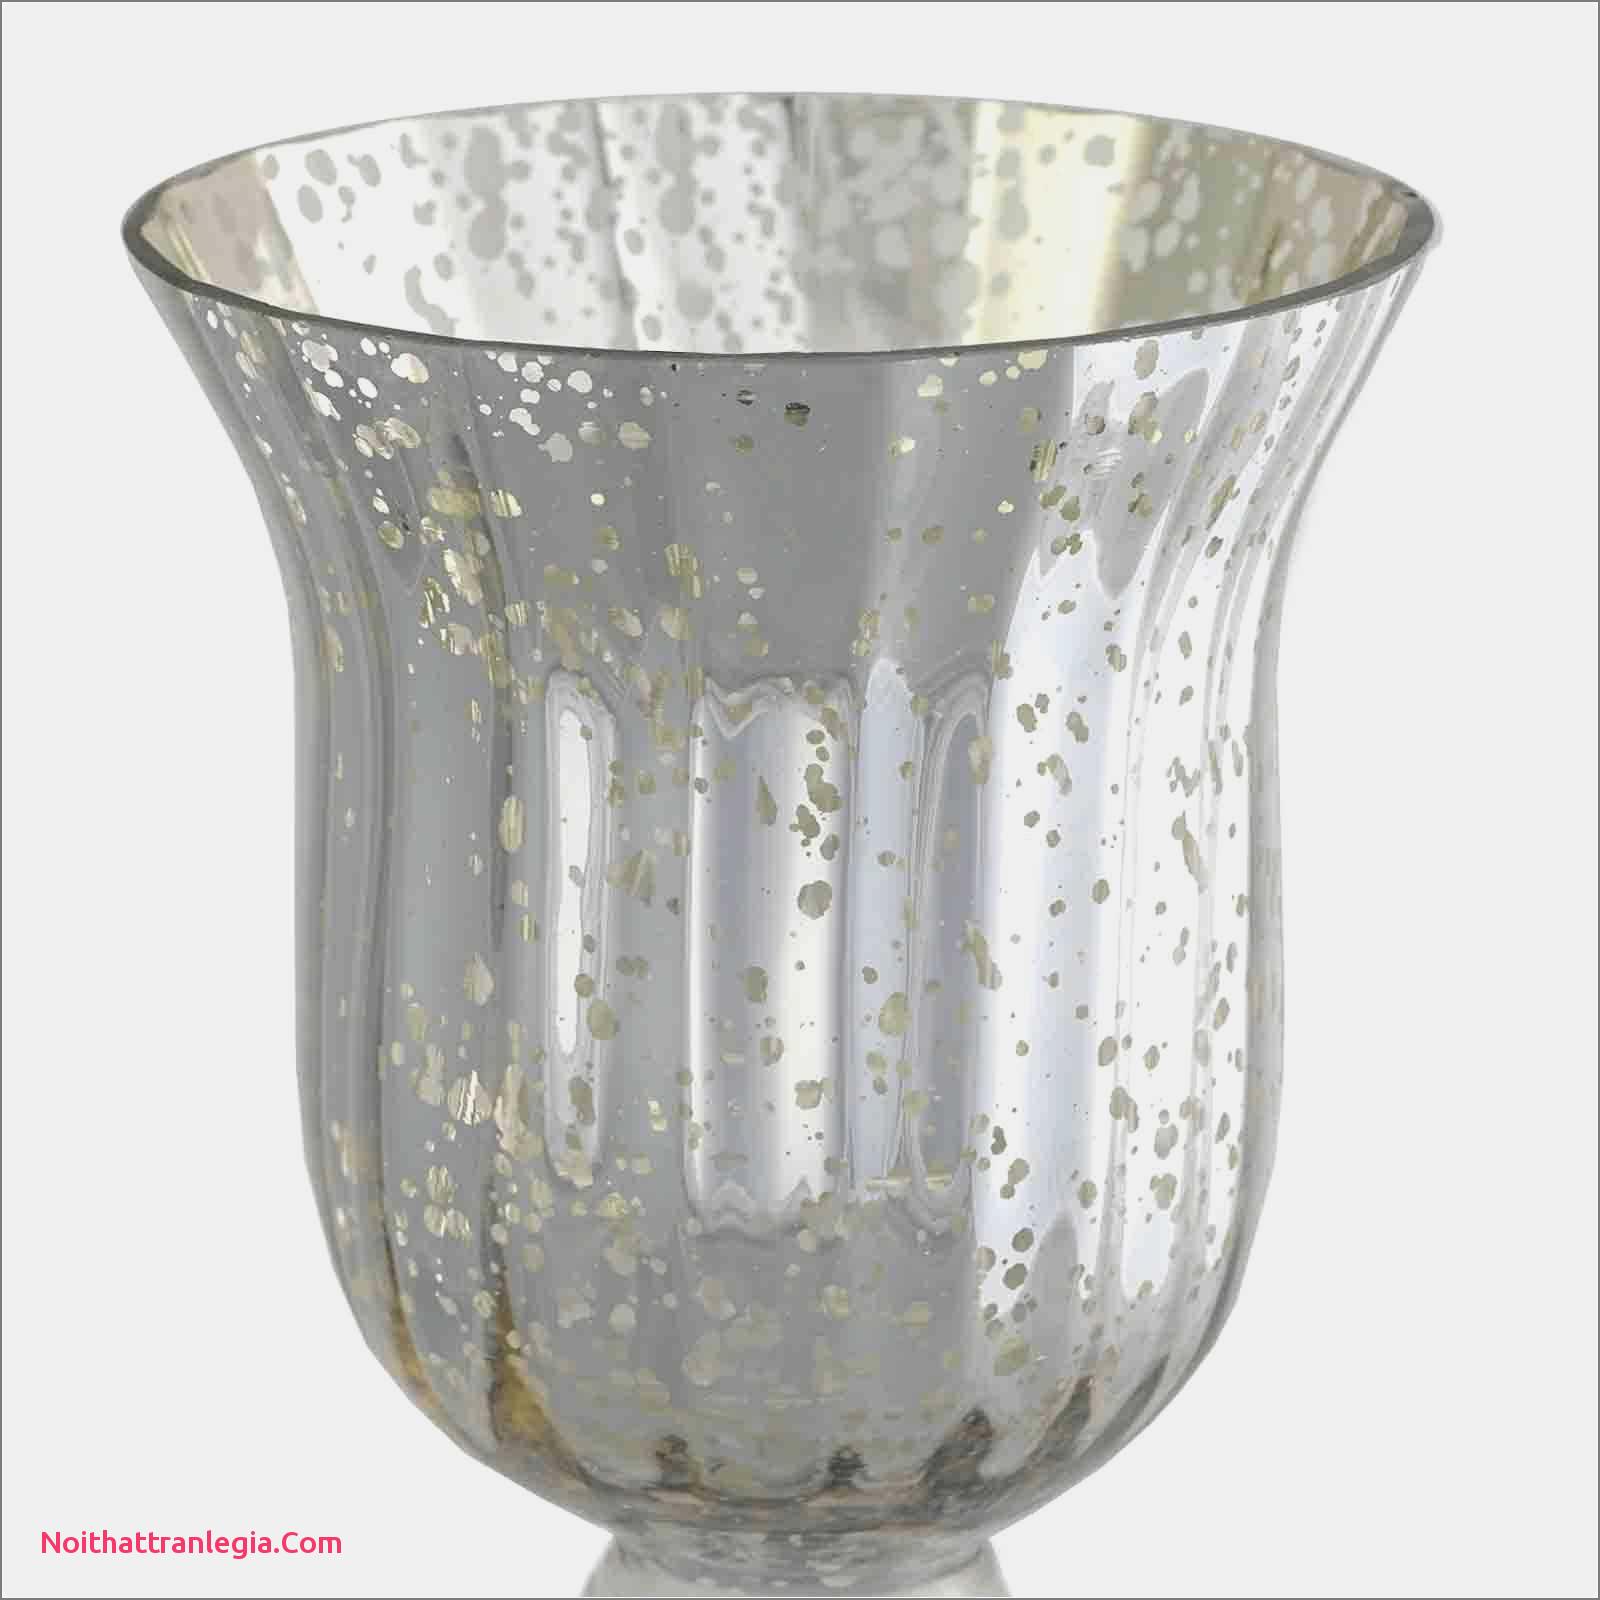 white porcelain vase of 20 wedding vases noithattranlegia vases design within wedding guest gift ideas inspirational candles for wedding favors superb pe s5h vases candle vase i